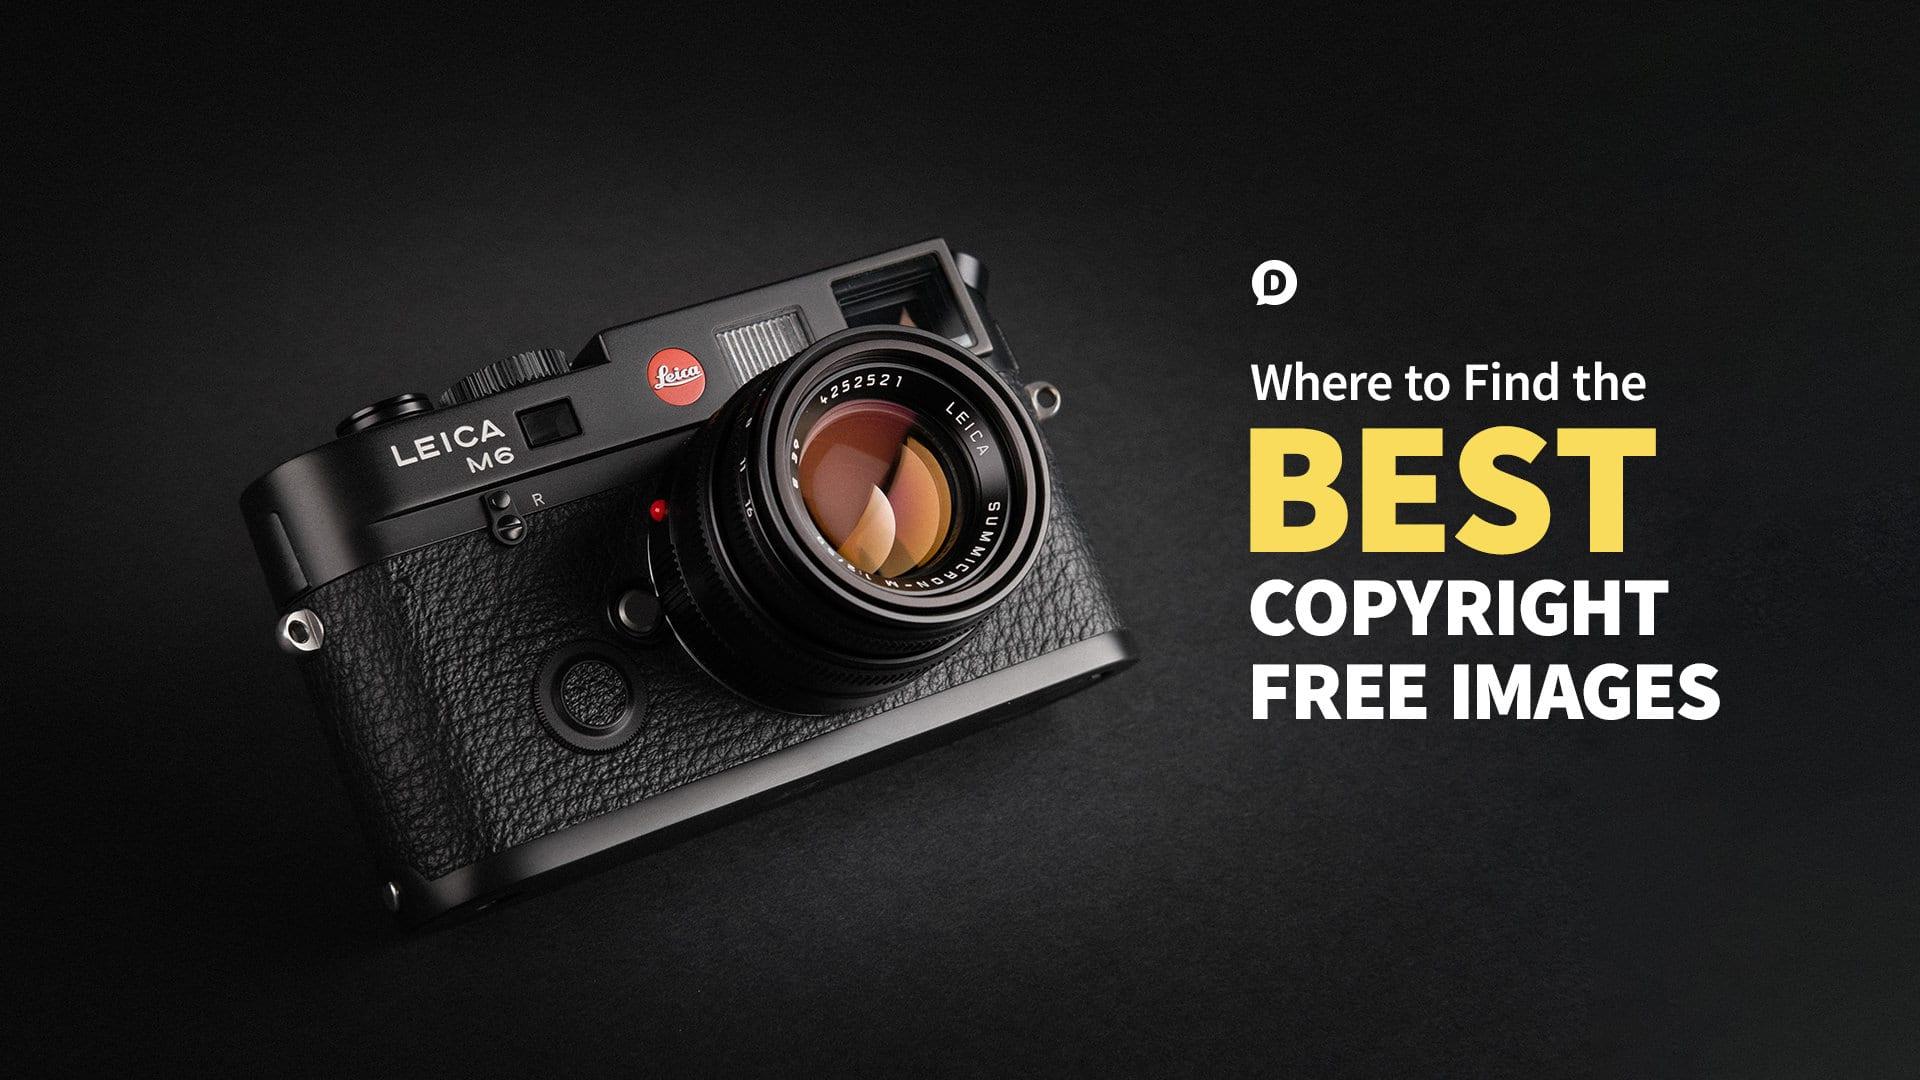 copyright free photo of a camera